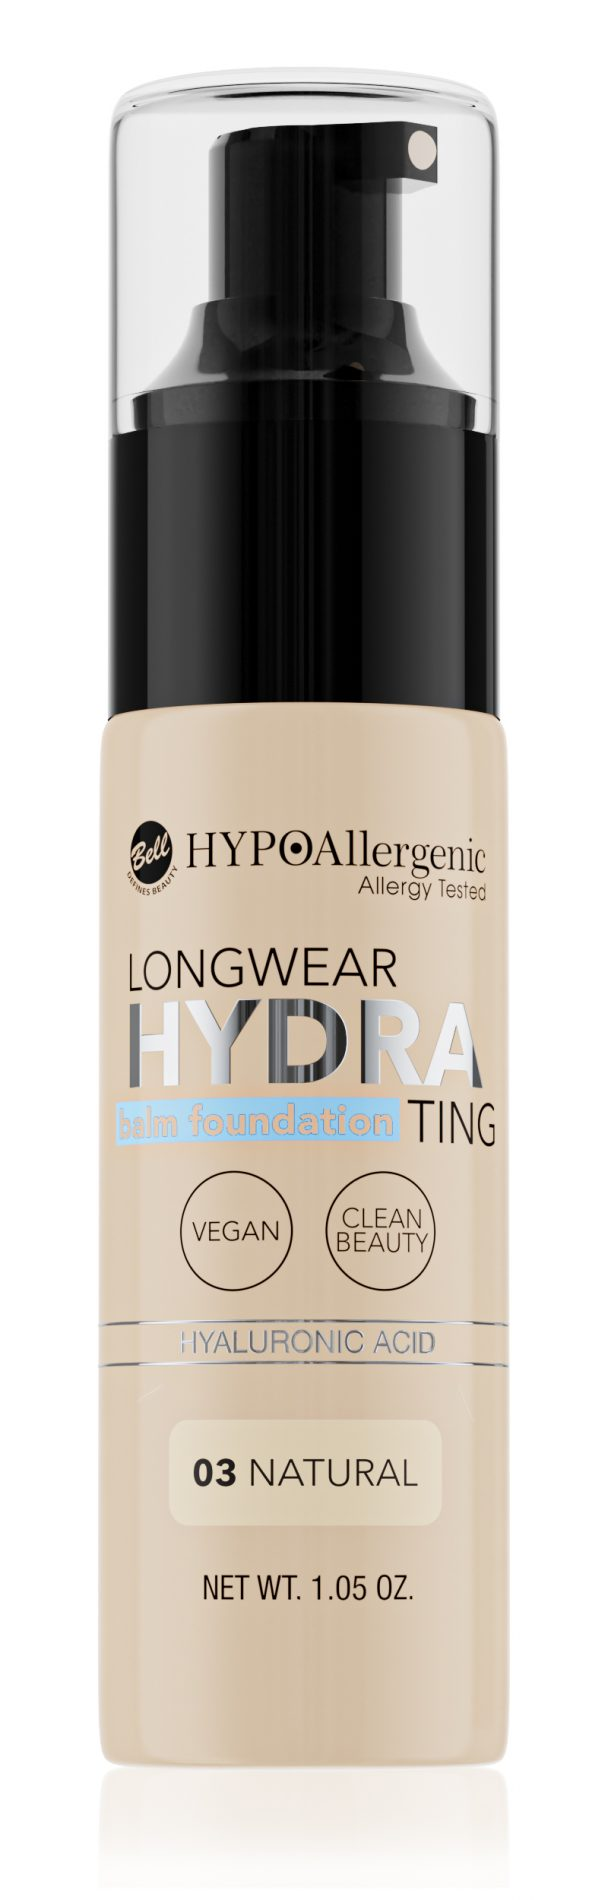 HYPOAllergenic Longwear Hydrating Balm Foundation 03 Natural